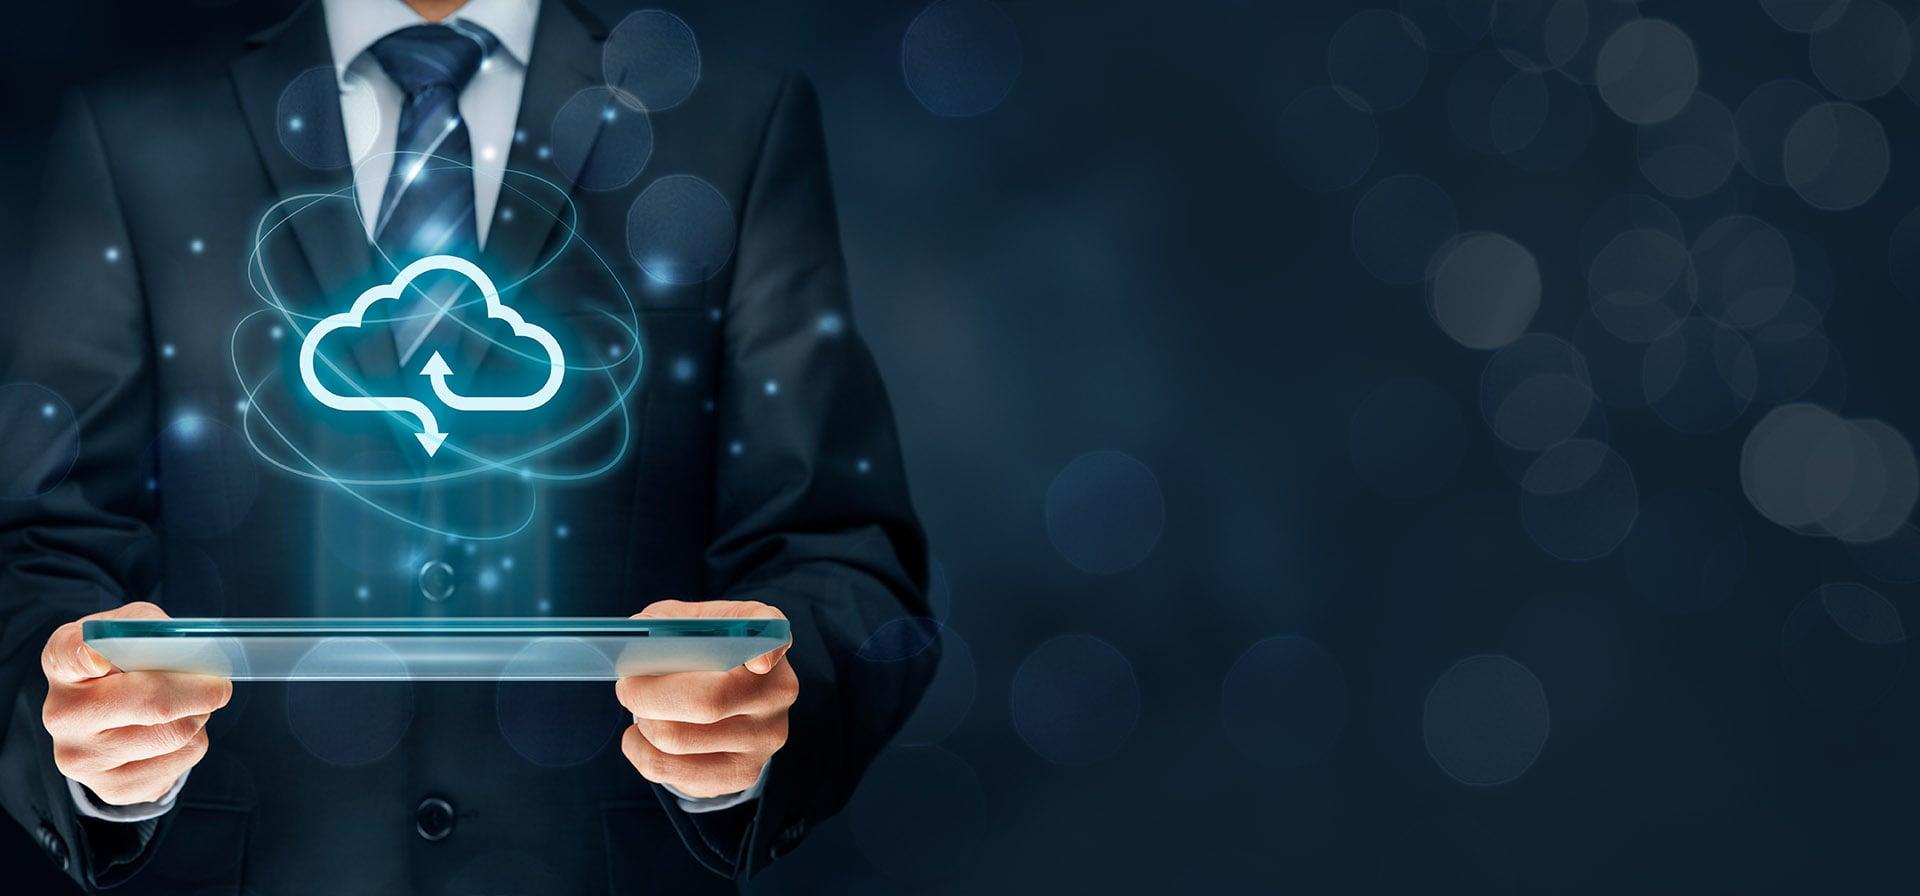 Covalense Global industry 4.0 Digital Transformation